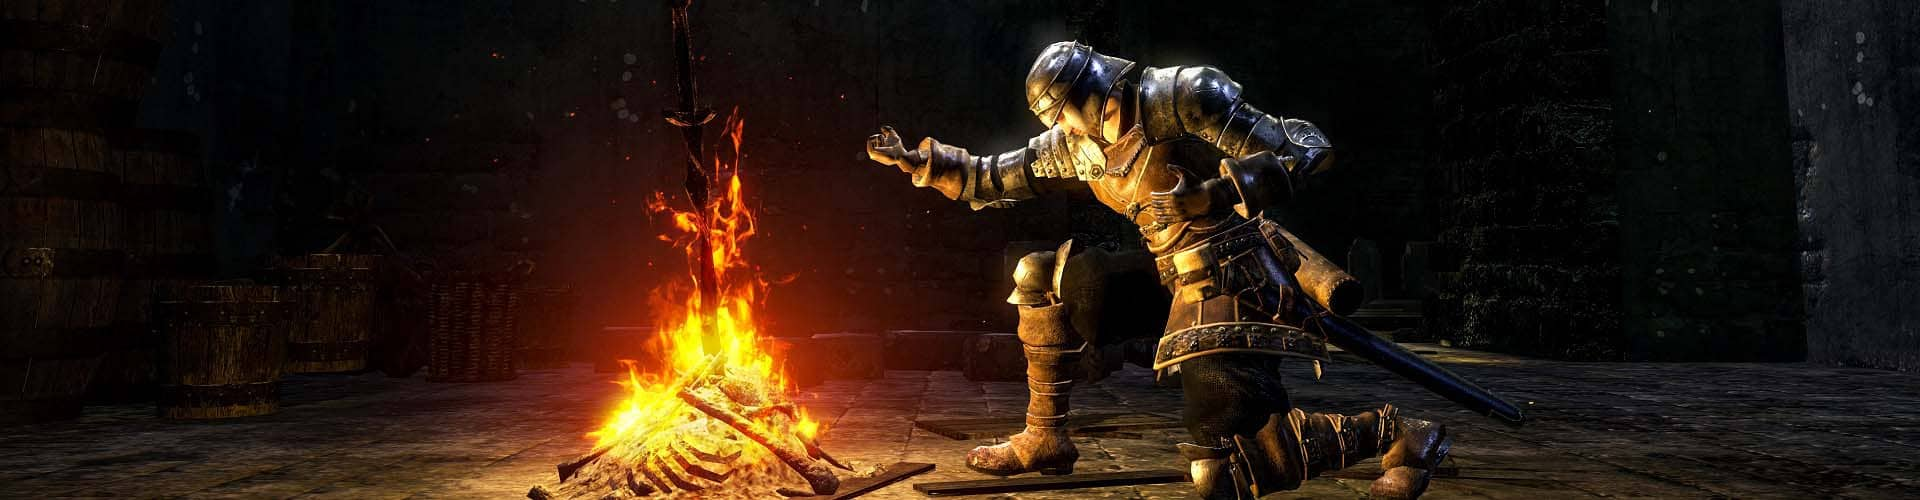 Dark Souls Game Order – The Complete List